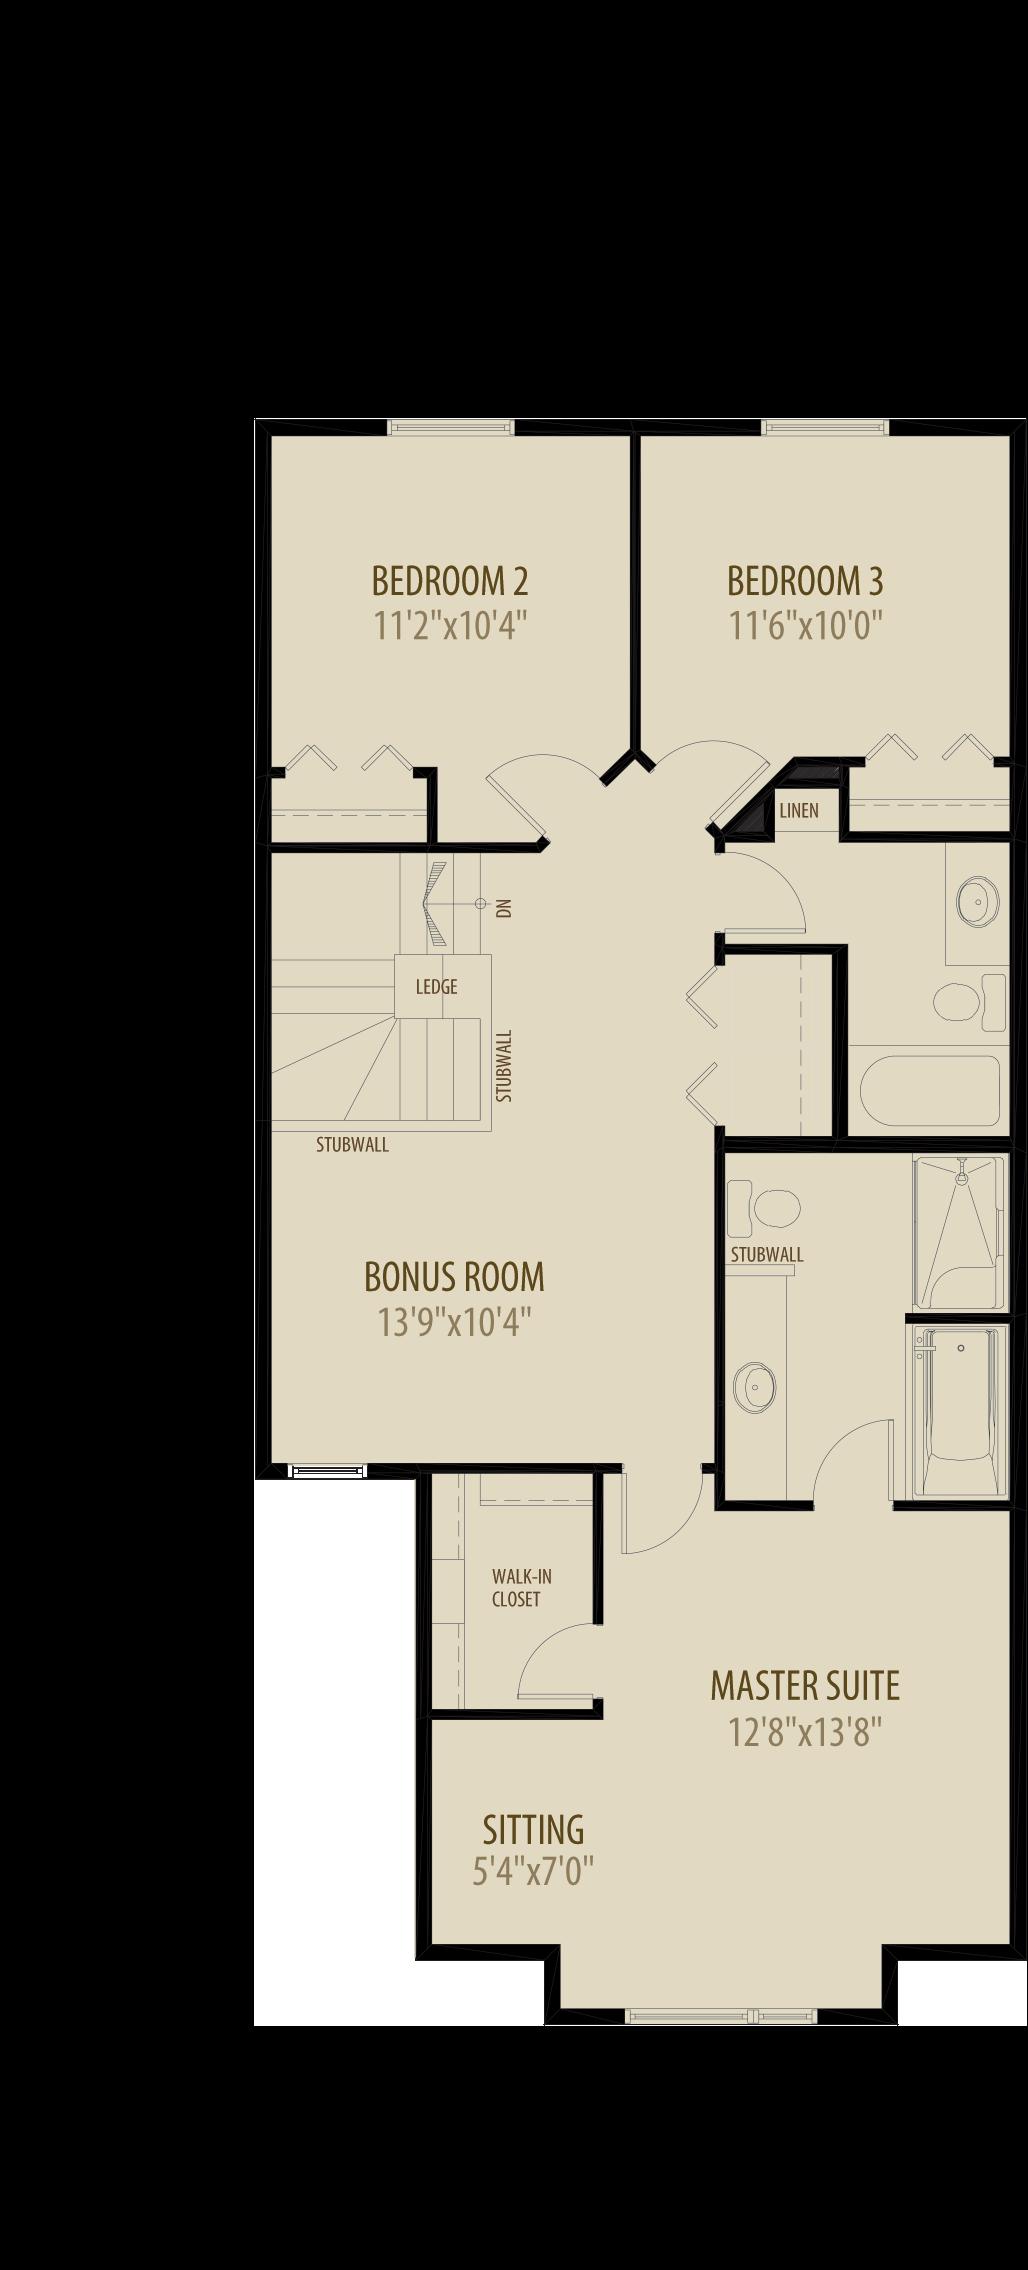 Option 3 Optional Bonus Room adds 241 sq ft